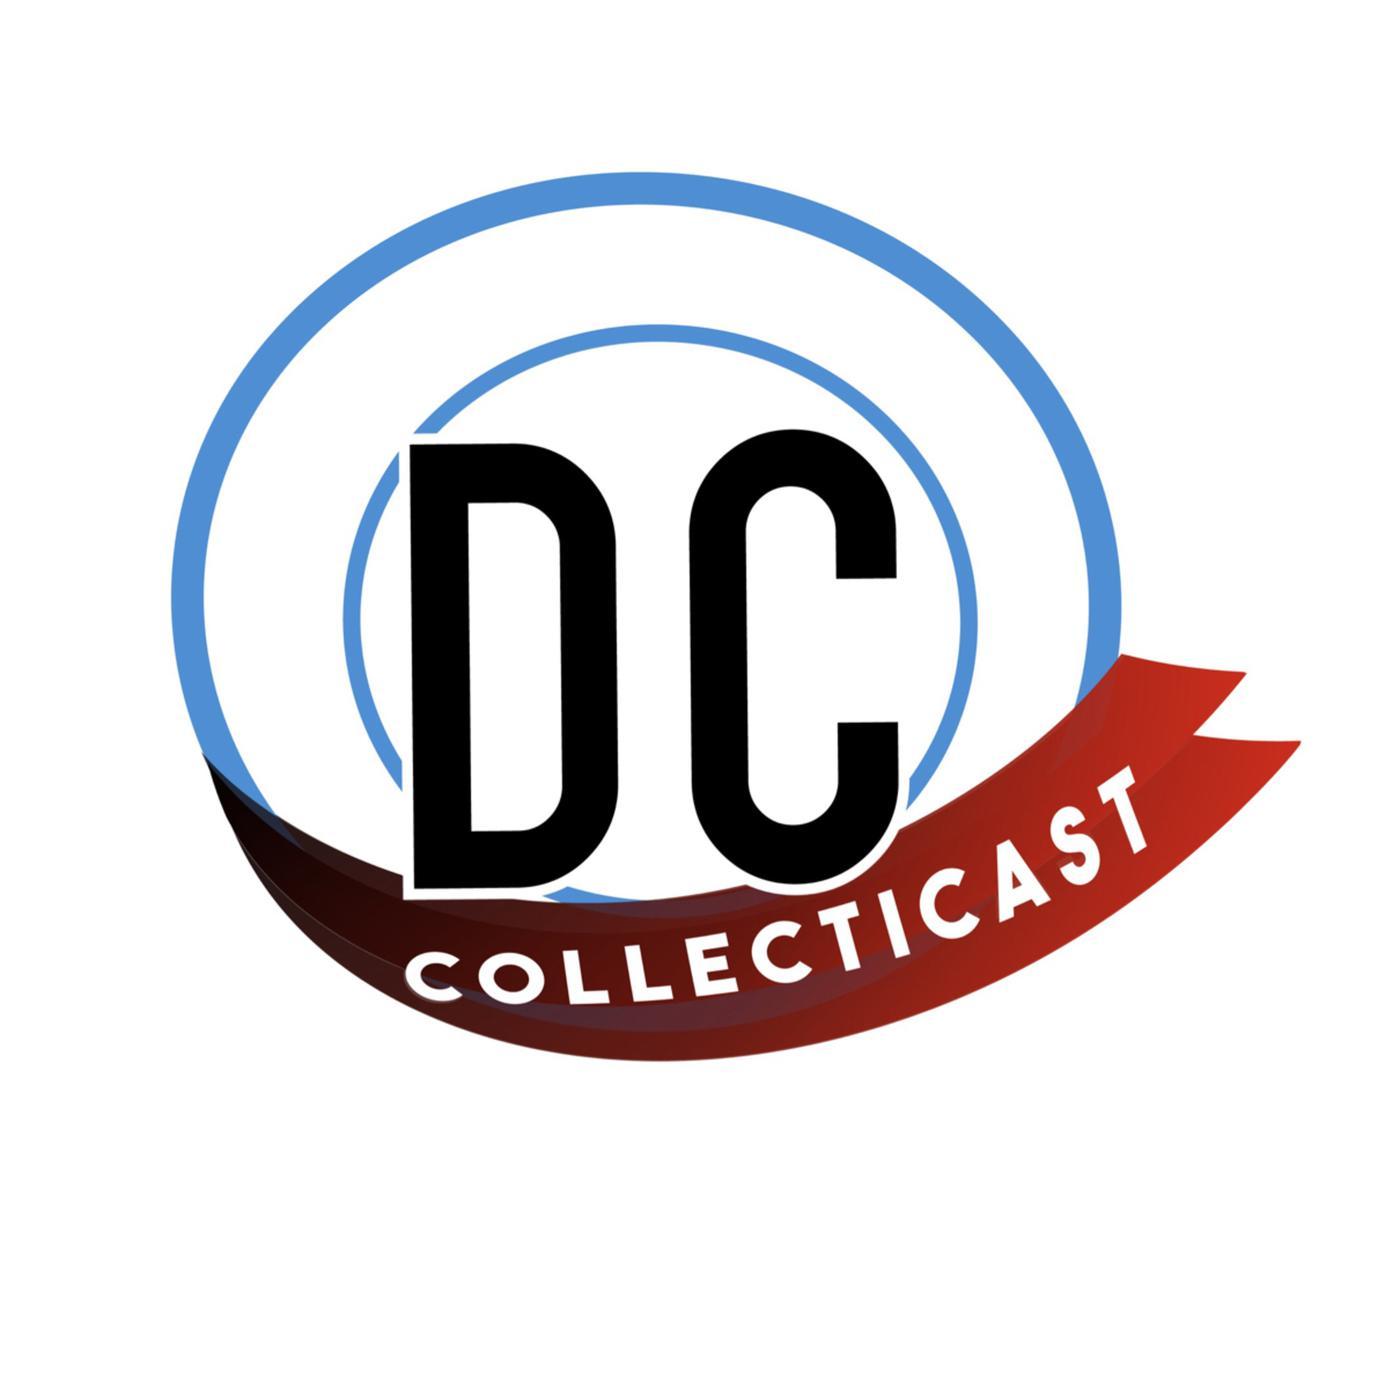 DC Collecticast (podcast) - DC Collecticast | Listen Notes